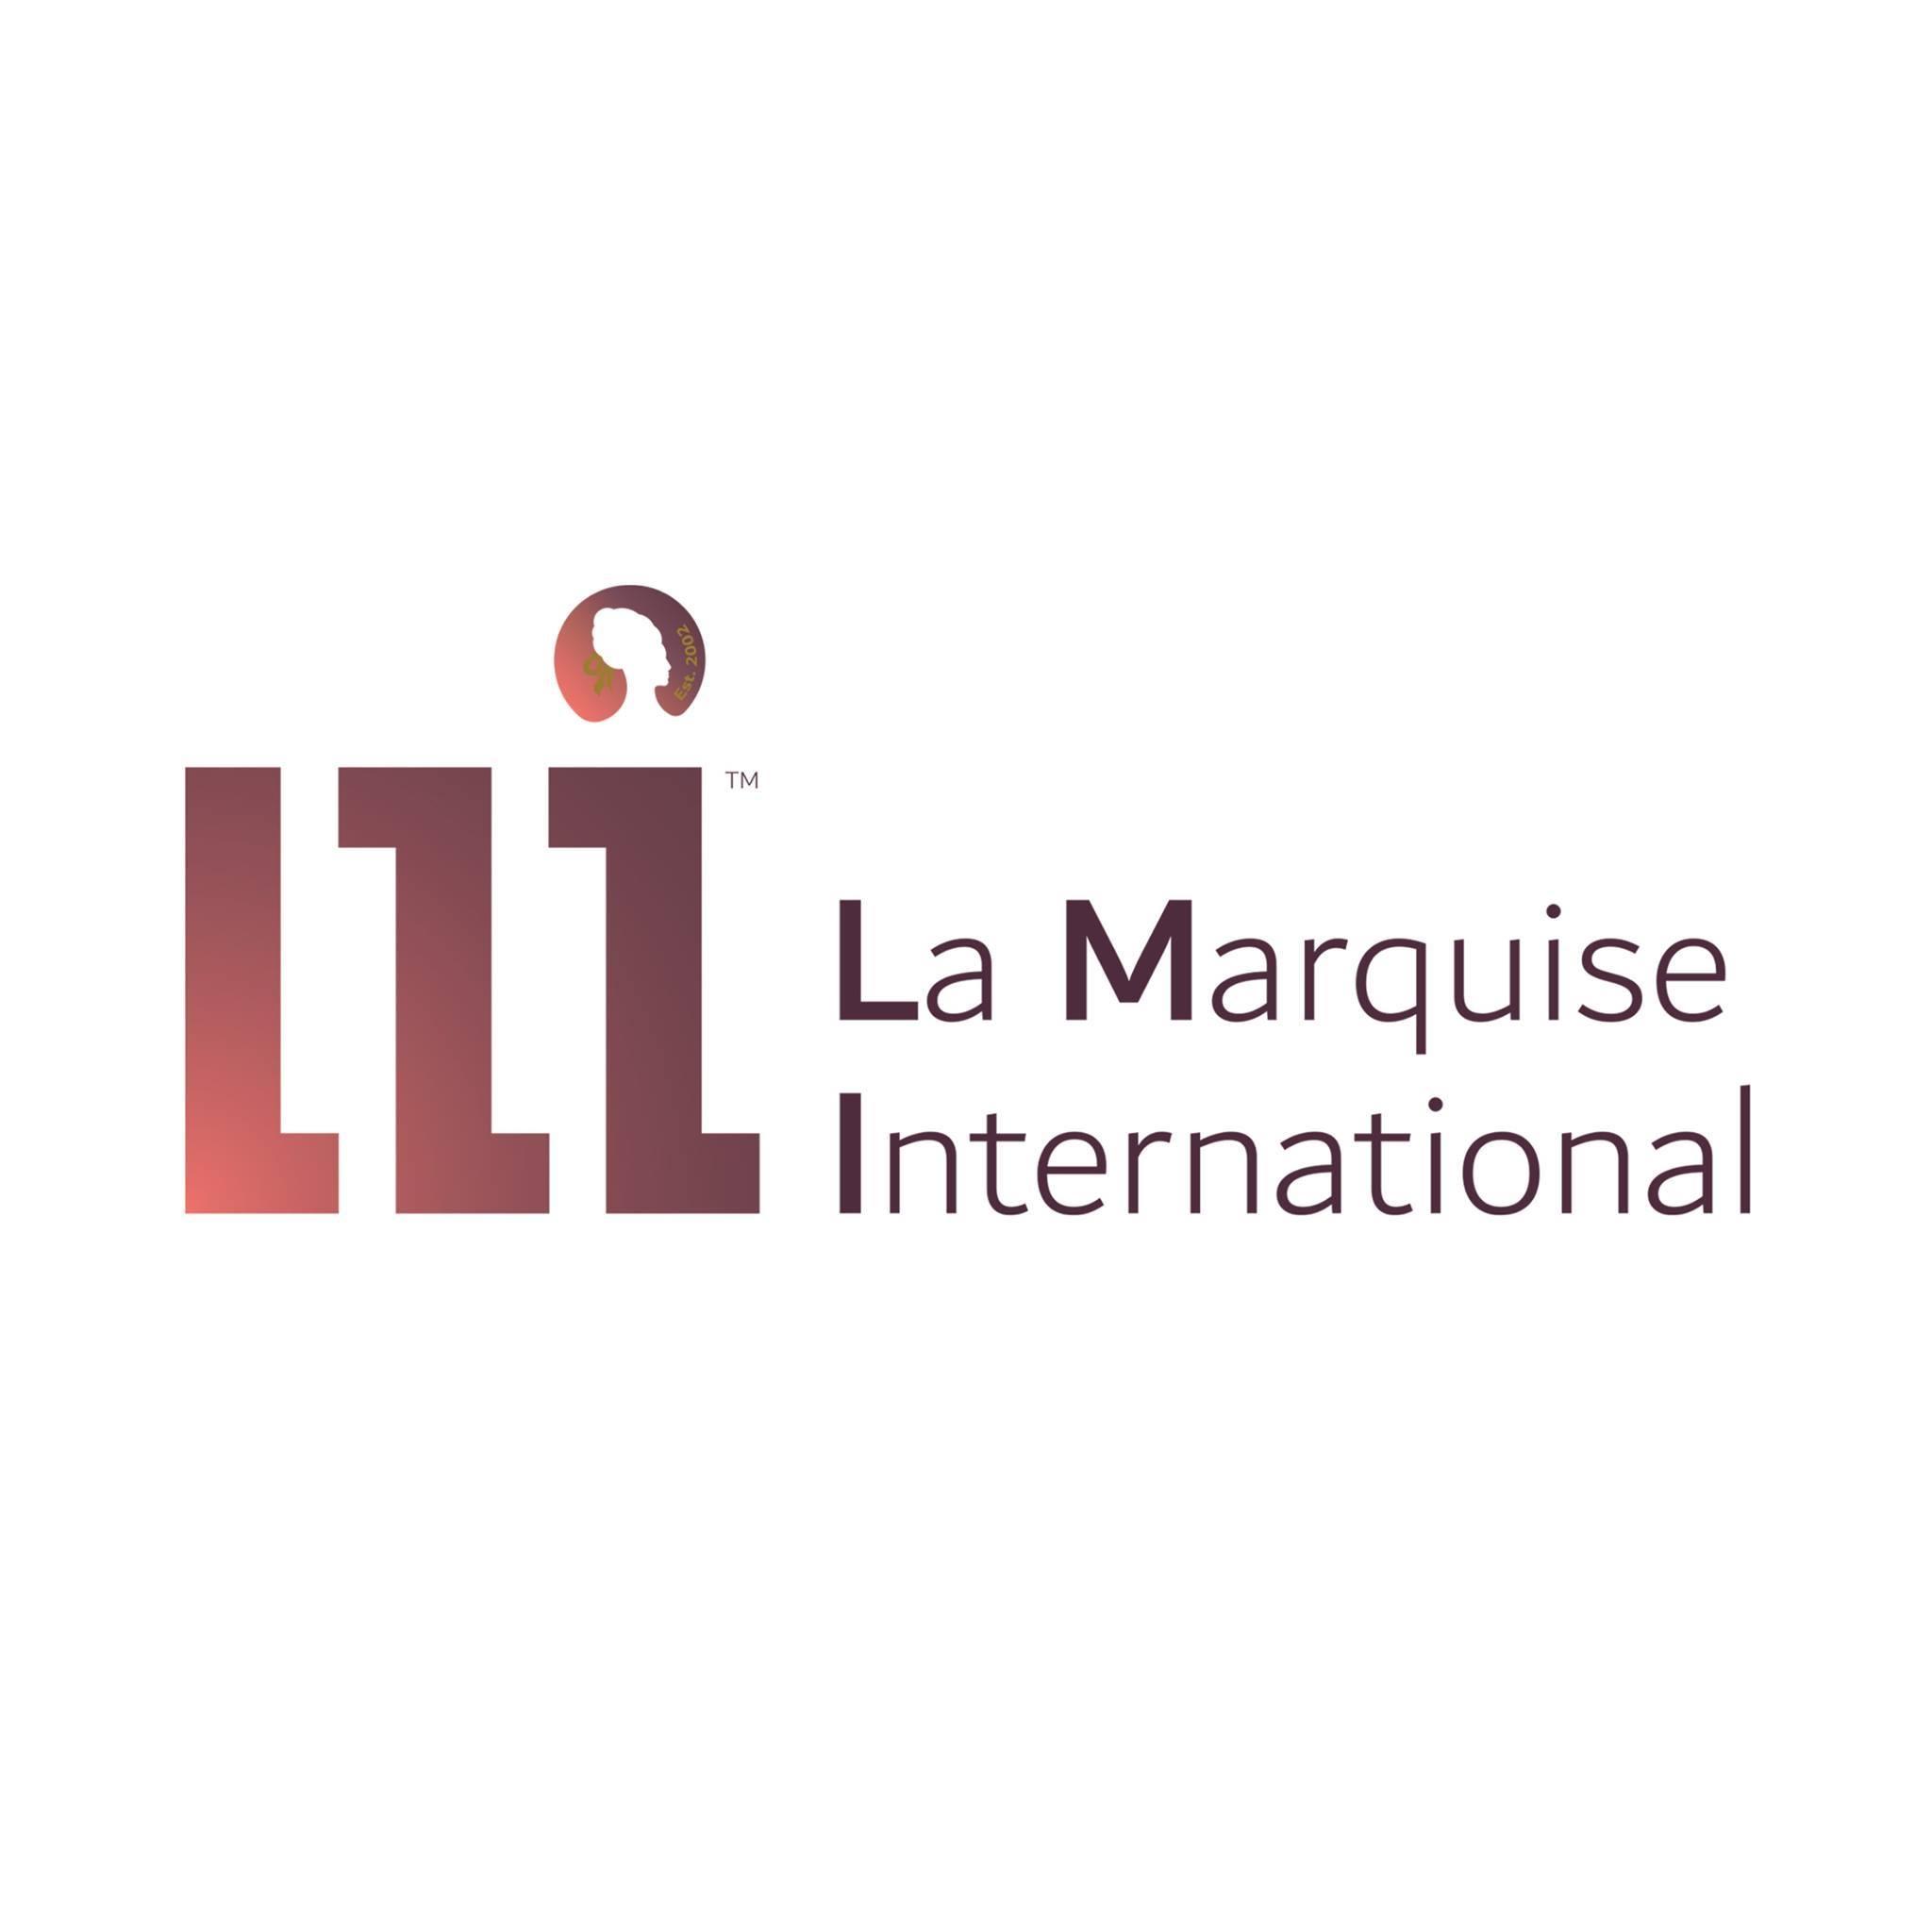 La Marquise International